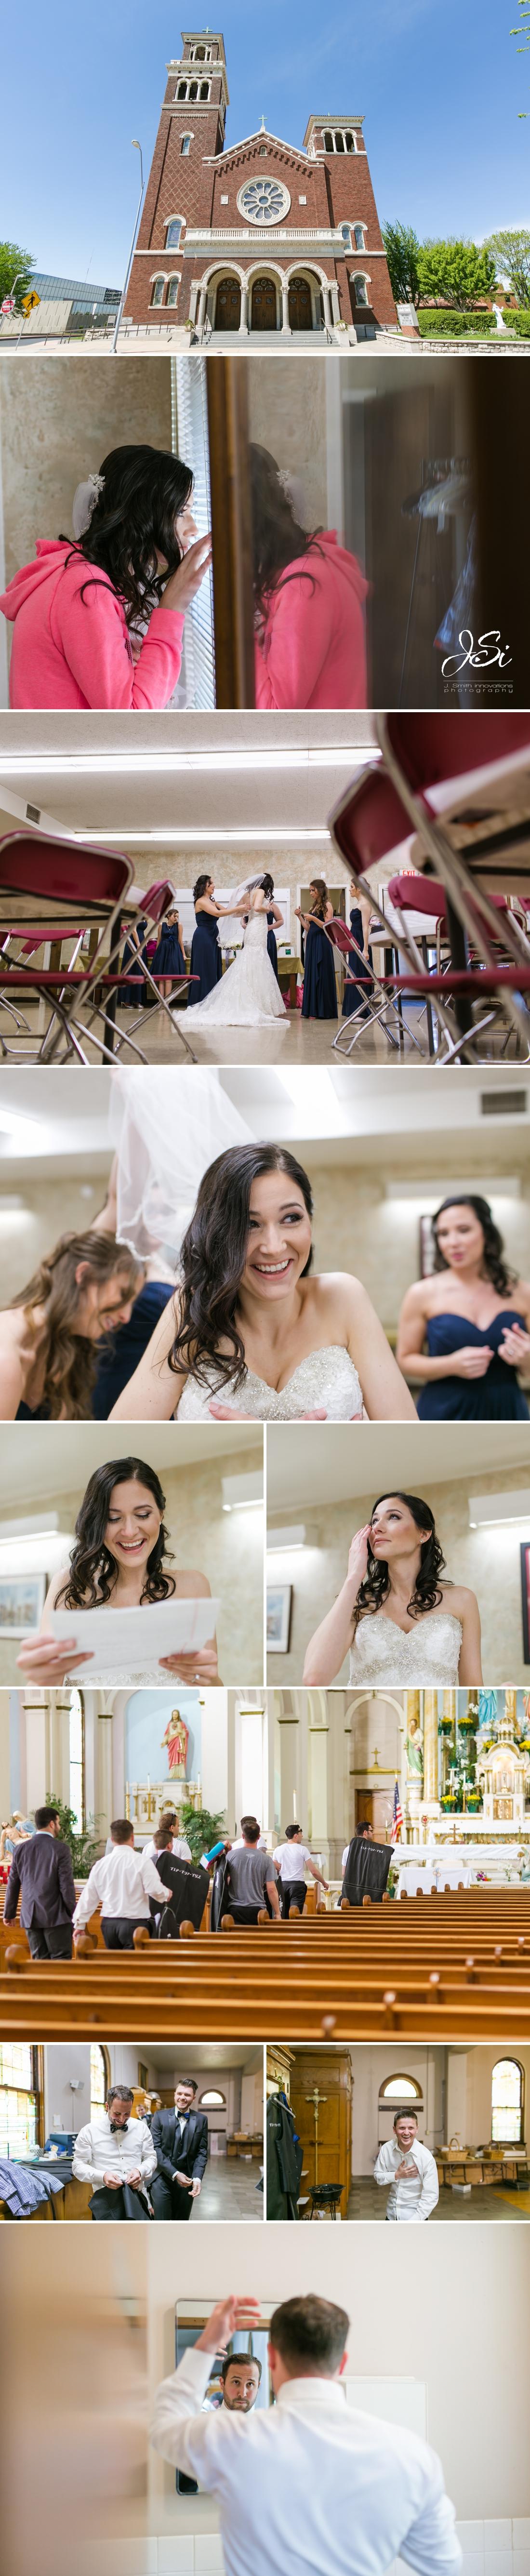 Kansas City fun heartfelt wedding picture